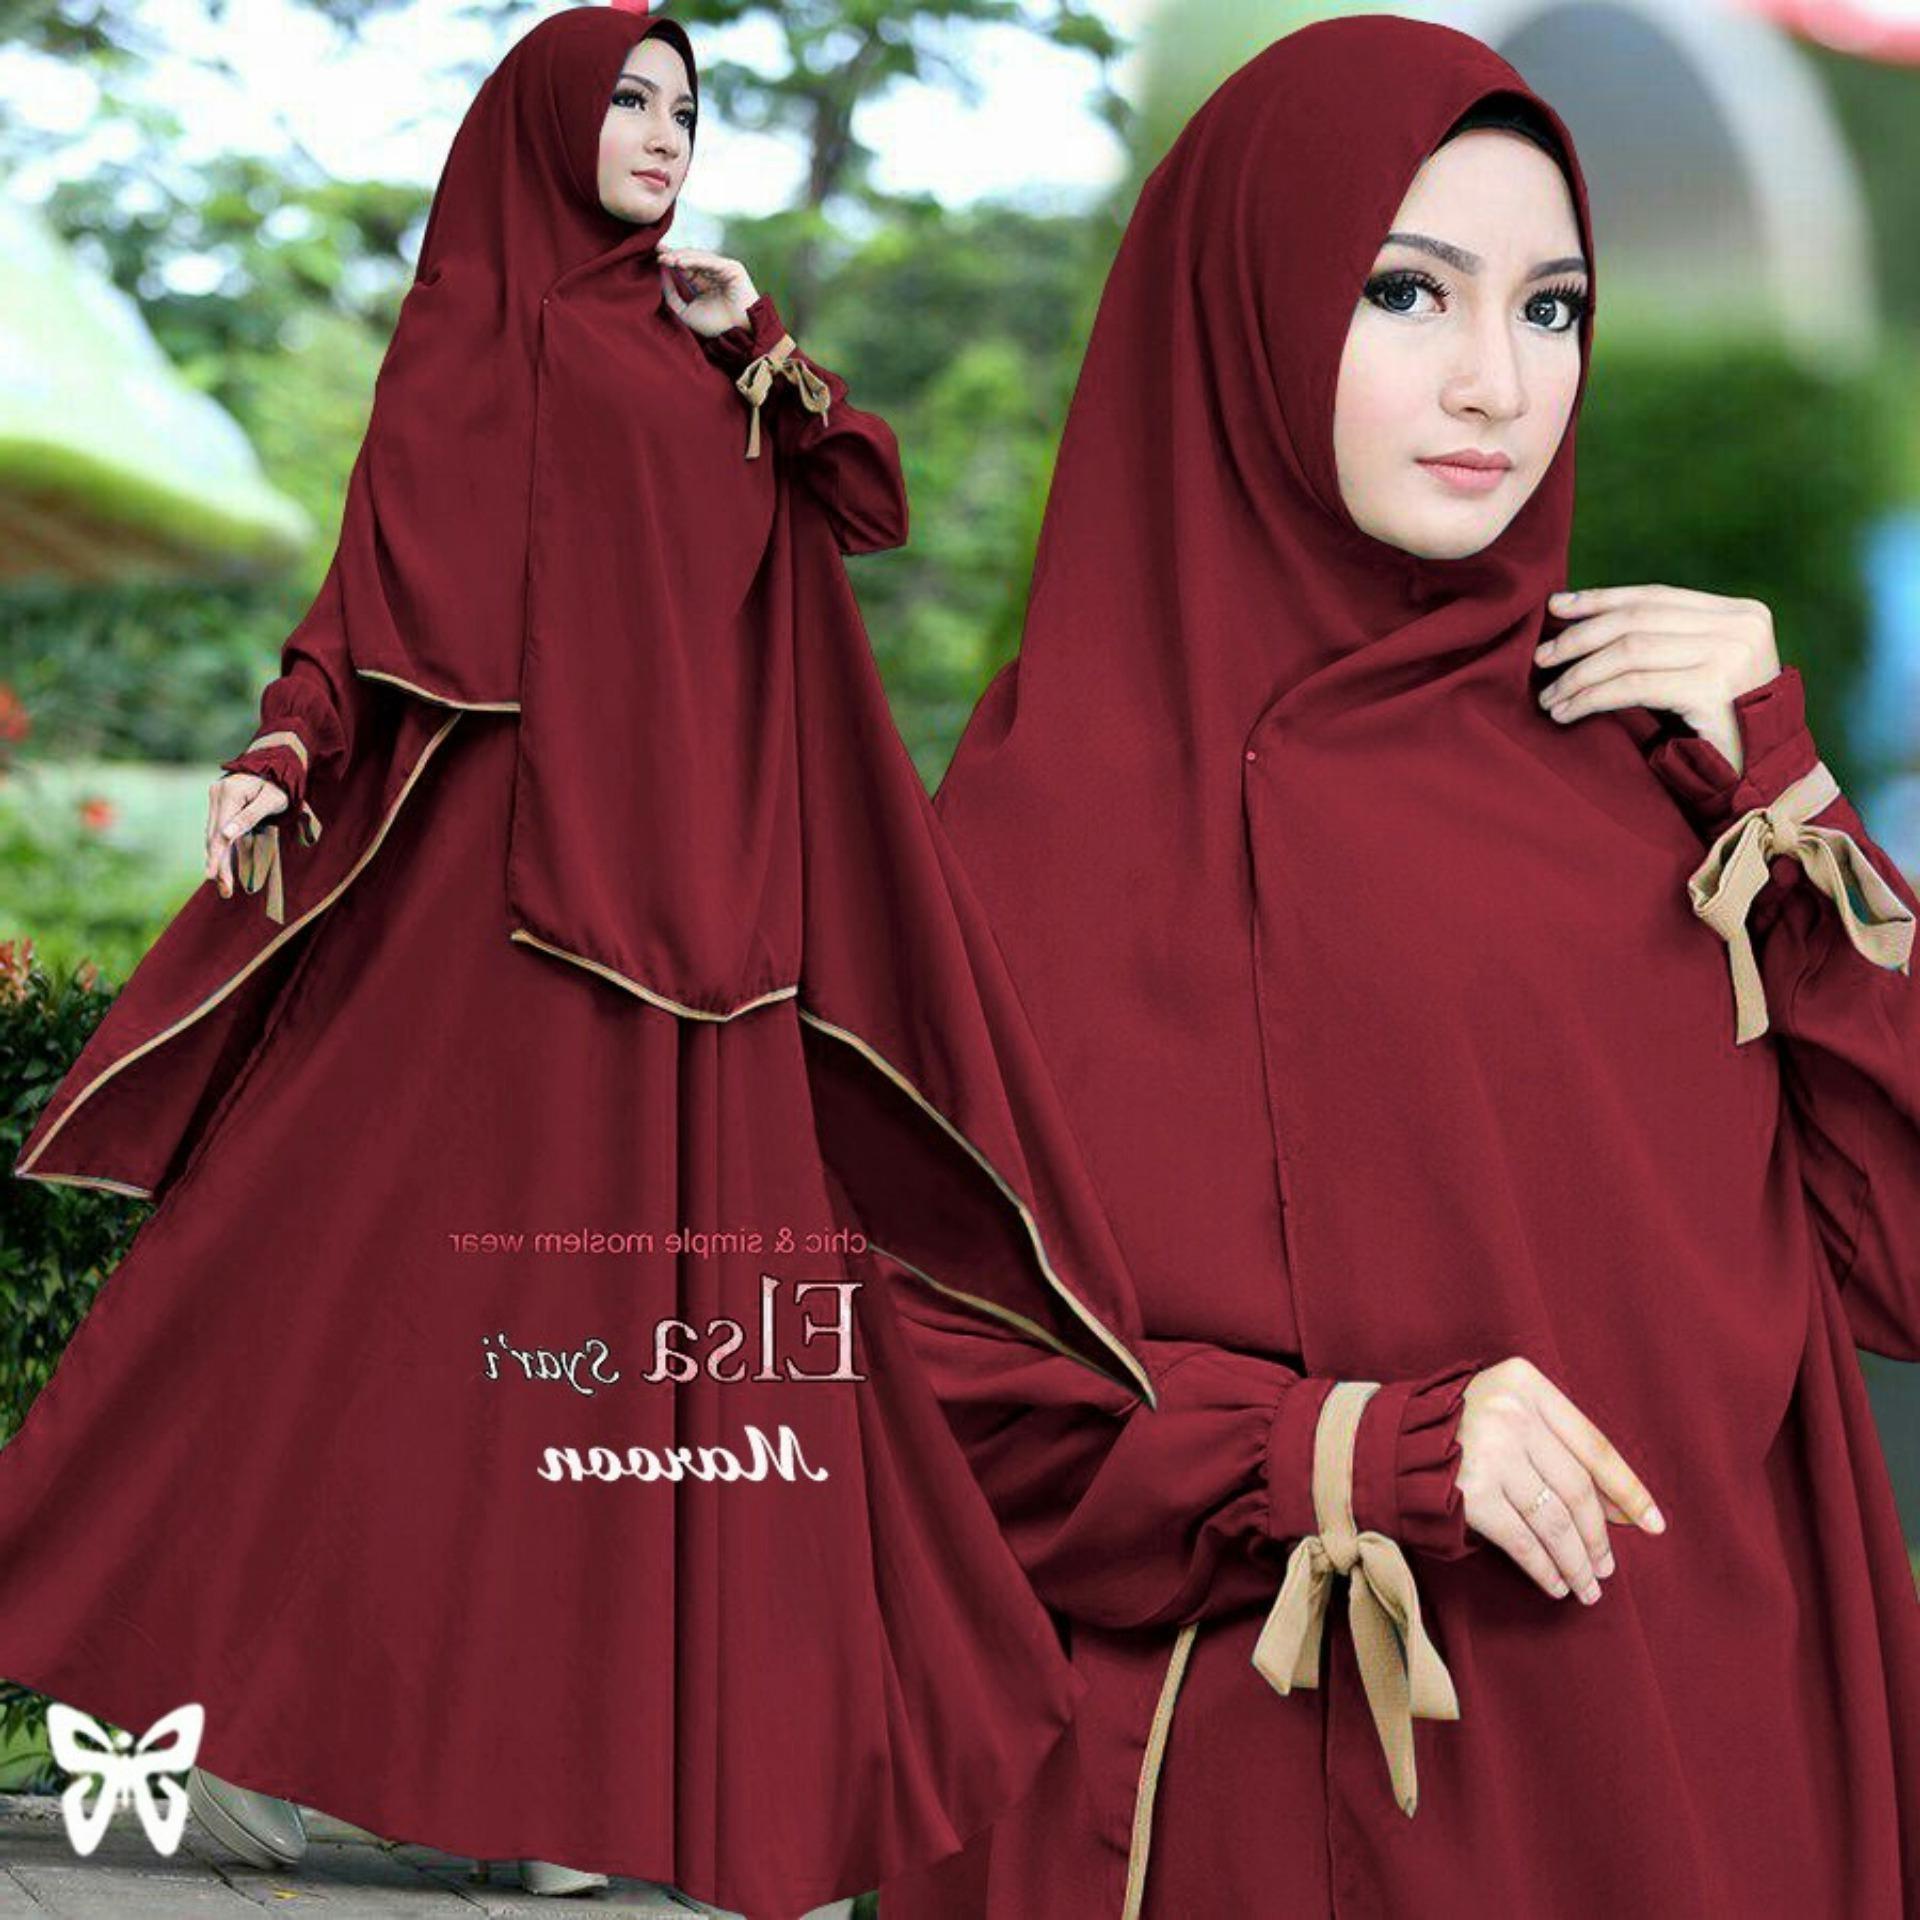 Bentuk Harga Gaun Pengantin Muslimah Syar'i Q0d4 Uc Baju Hijab Muslim Kayra Gamis Syari Syar&39i Fashion